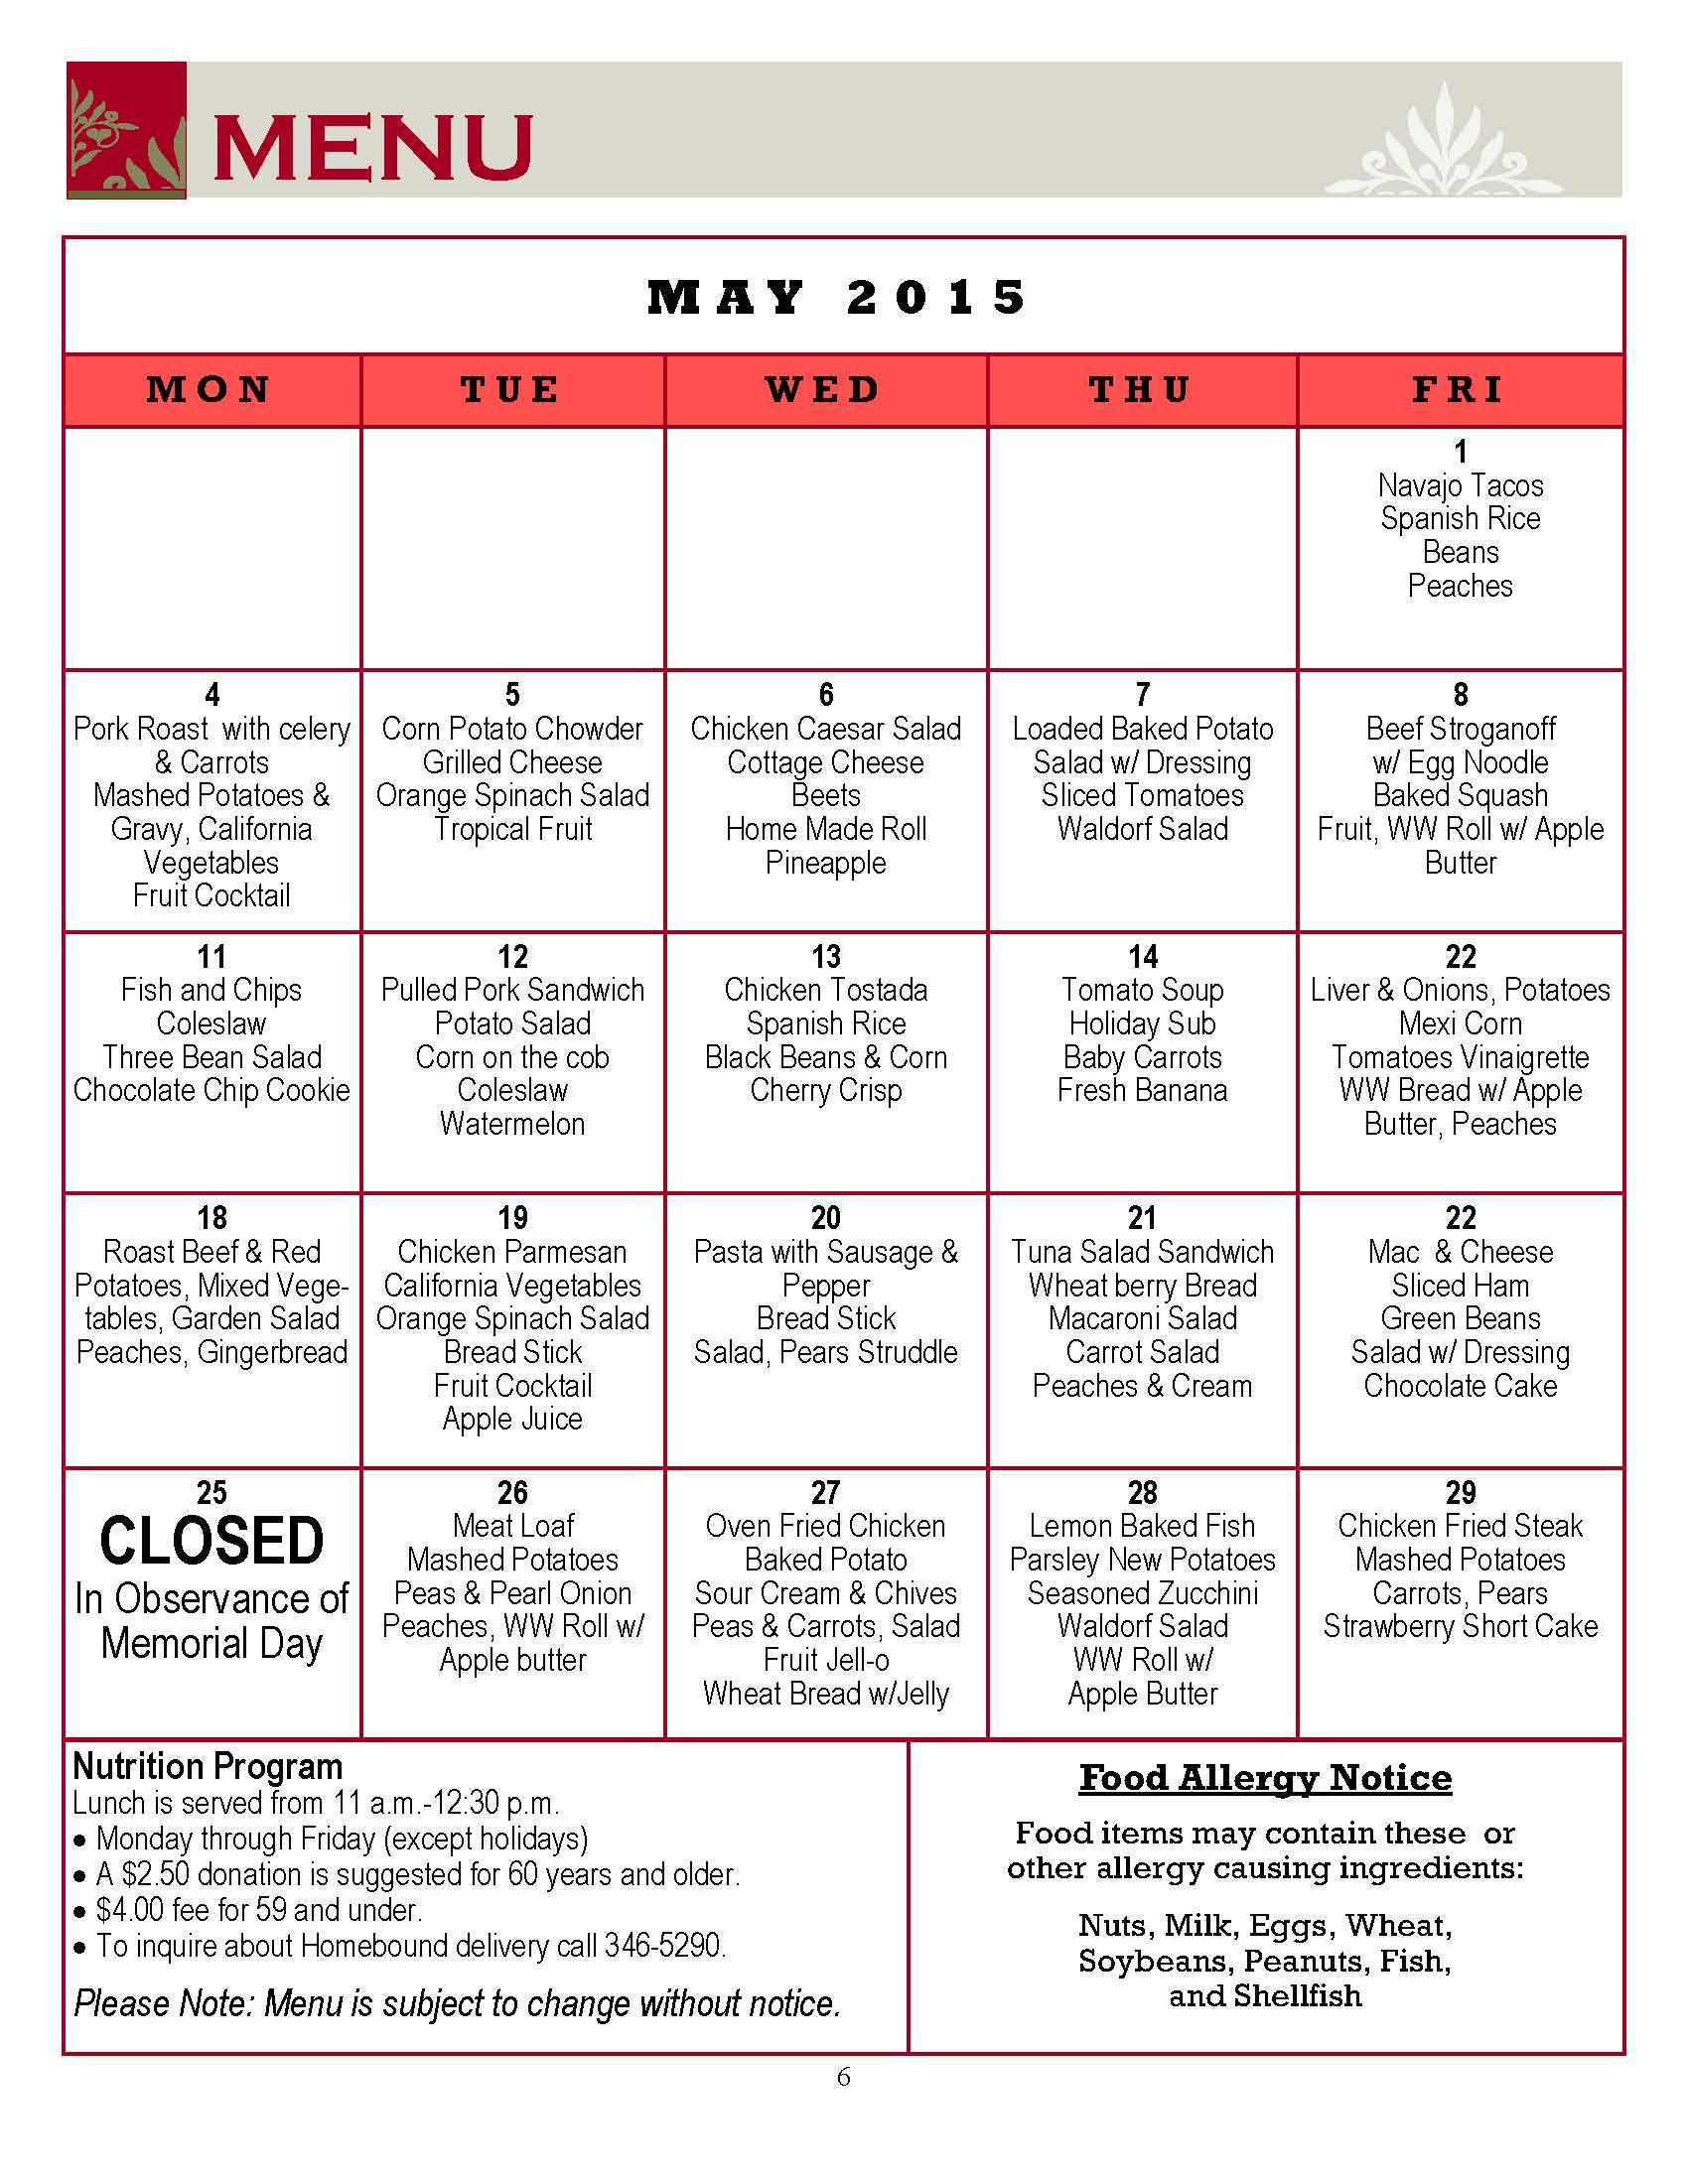 May 2015 Senior Center Menu